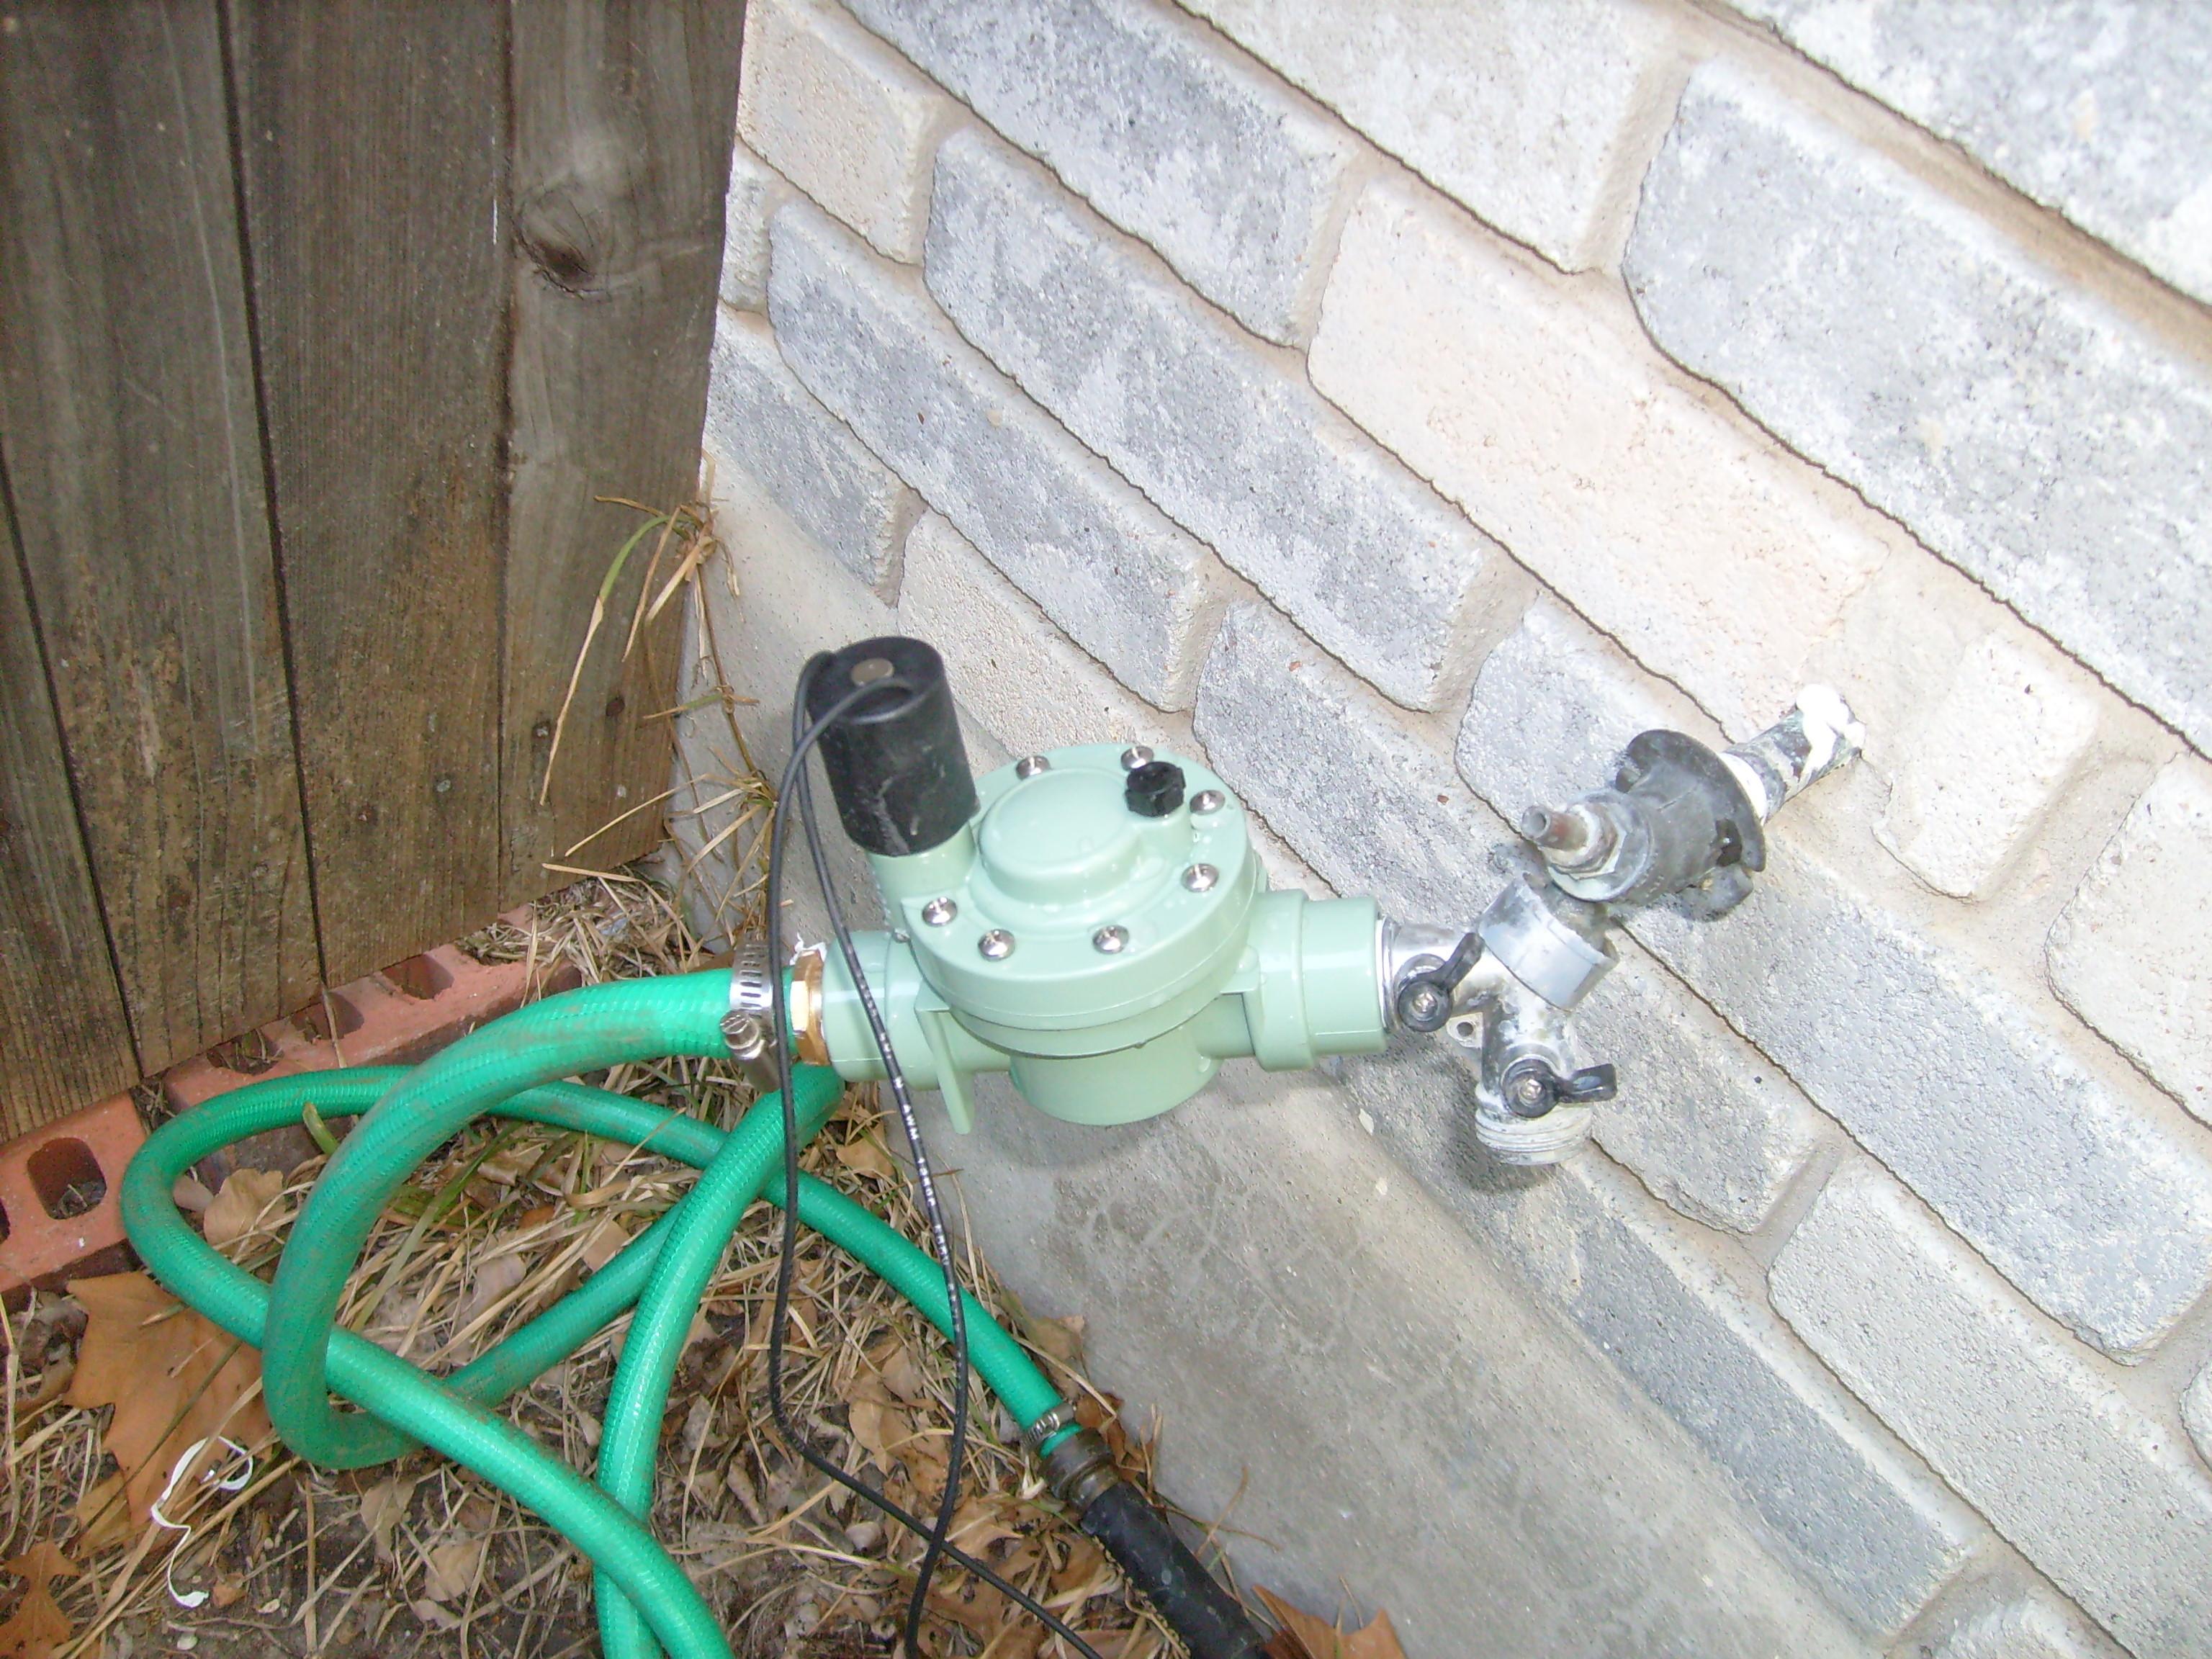 Poor-mans automatic sprinkler.